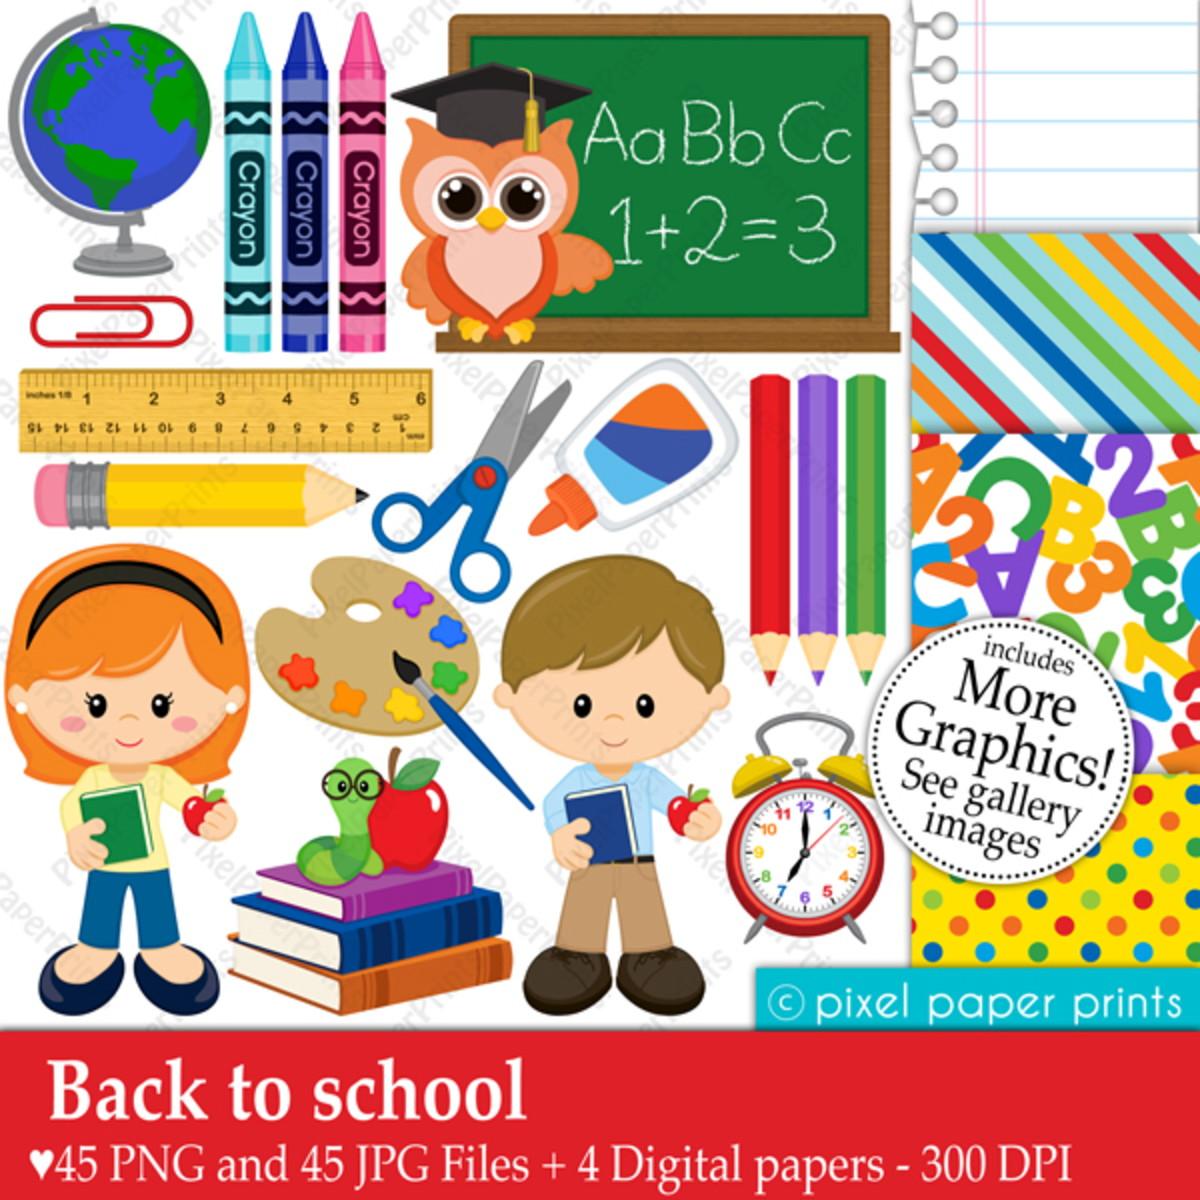 Fundo escolar clipart royalty free stock Kit Digital Volta às aulas Material escolar Clipart PP royalty free stock